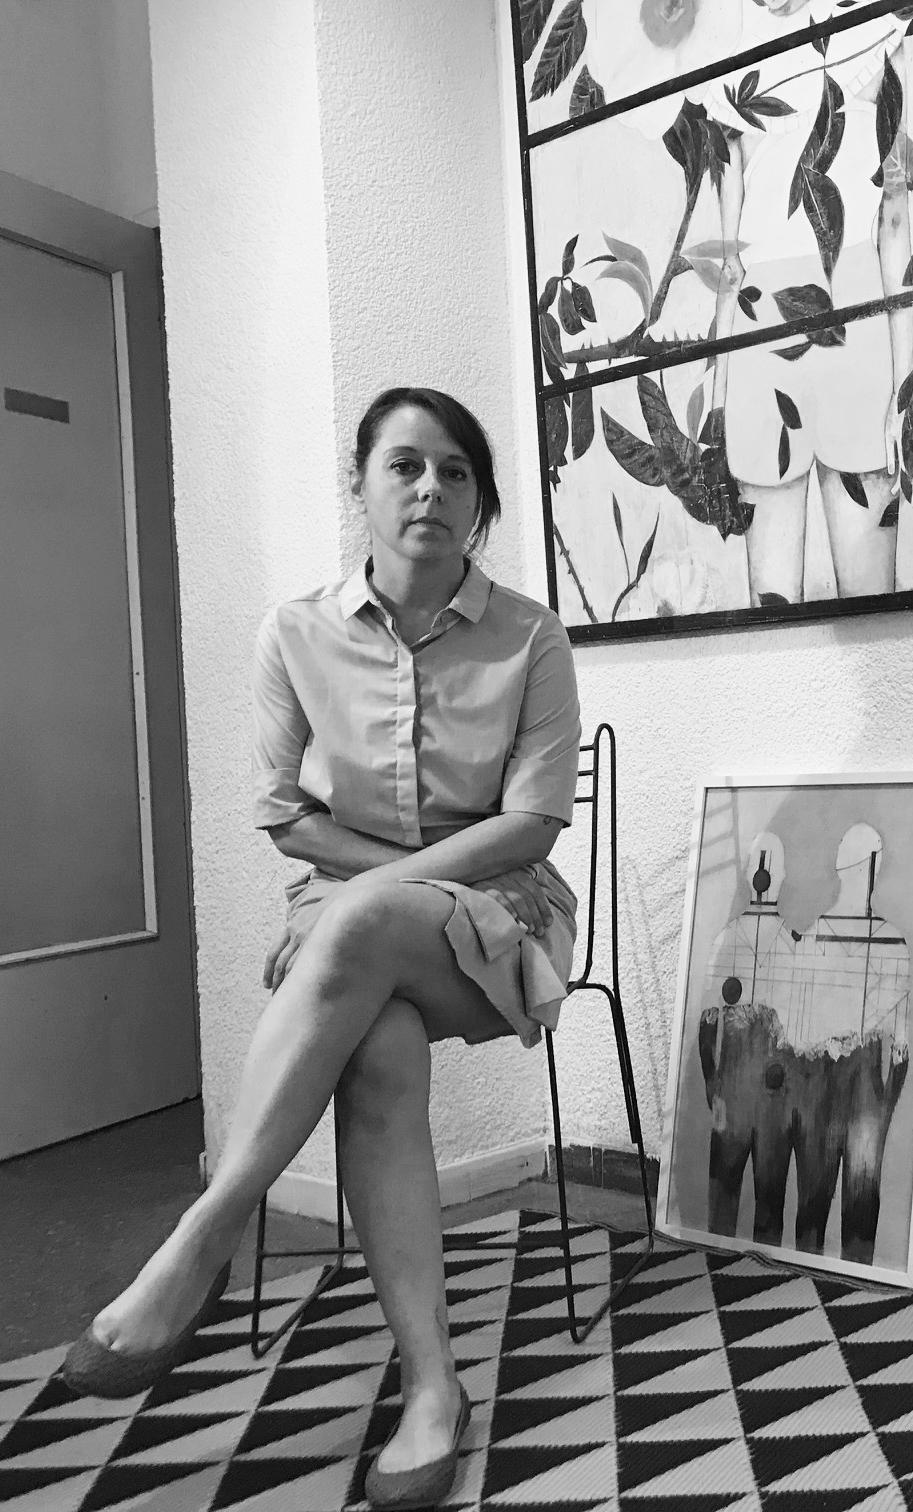 karenina Fabrizzi, Tagsmart artist of the week